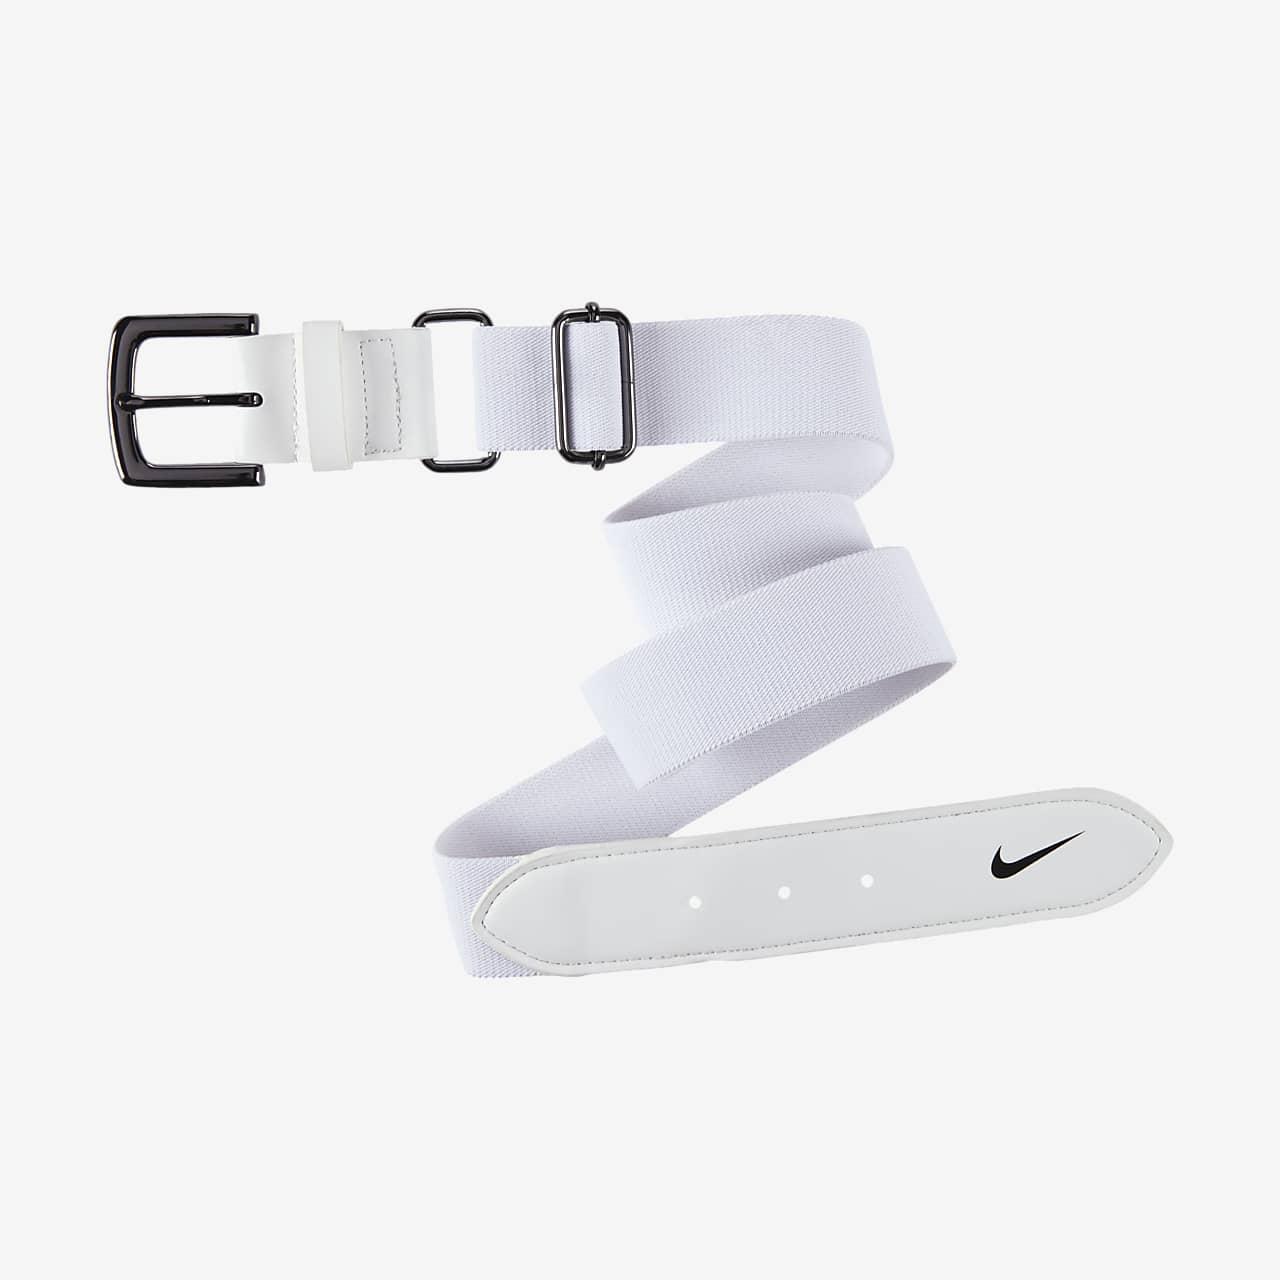 Cinturón de béisbol para hombre Nike 2.0